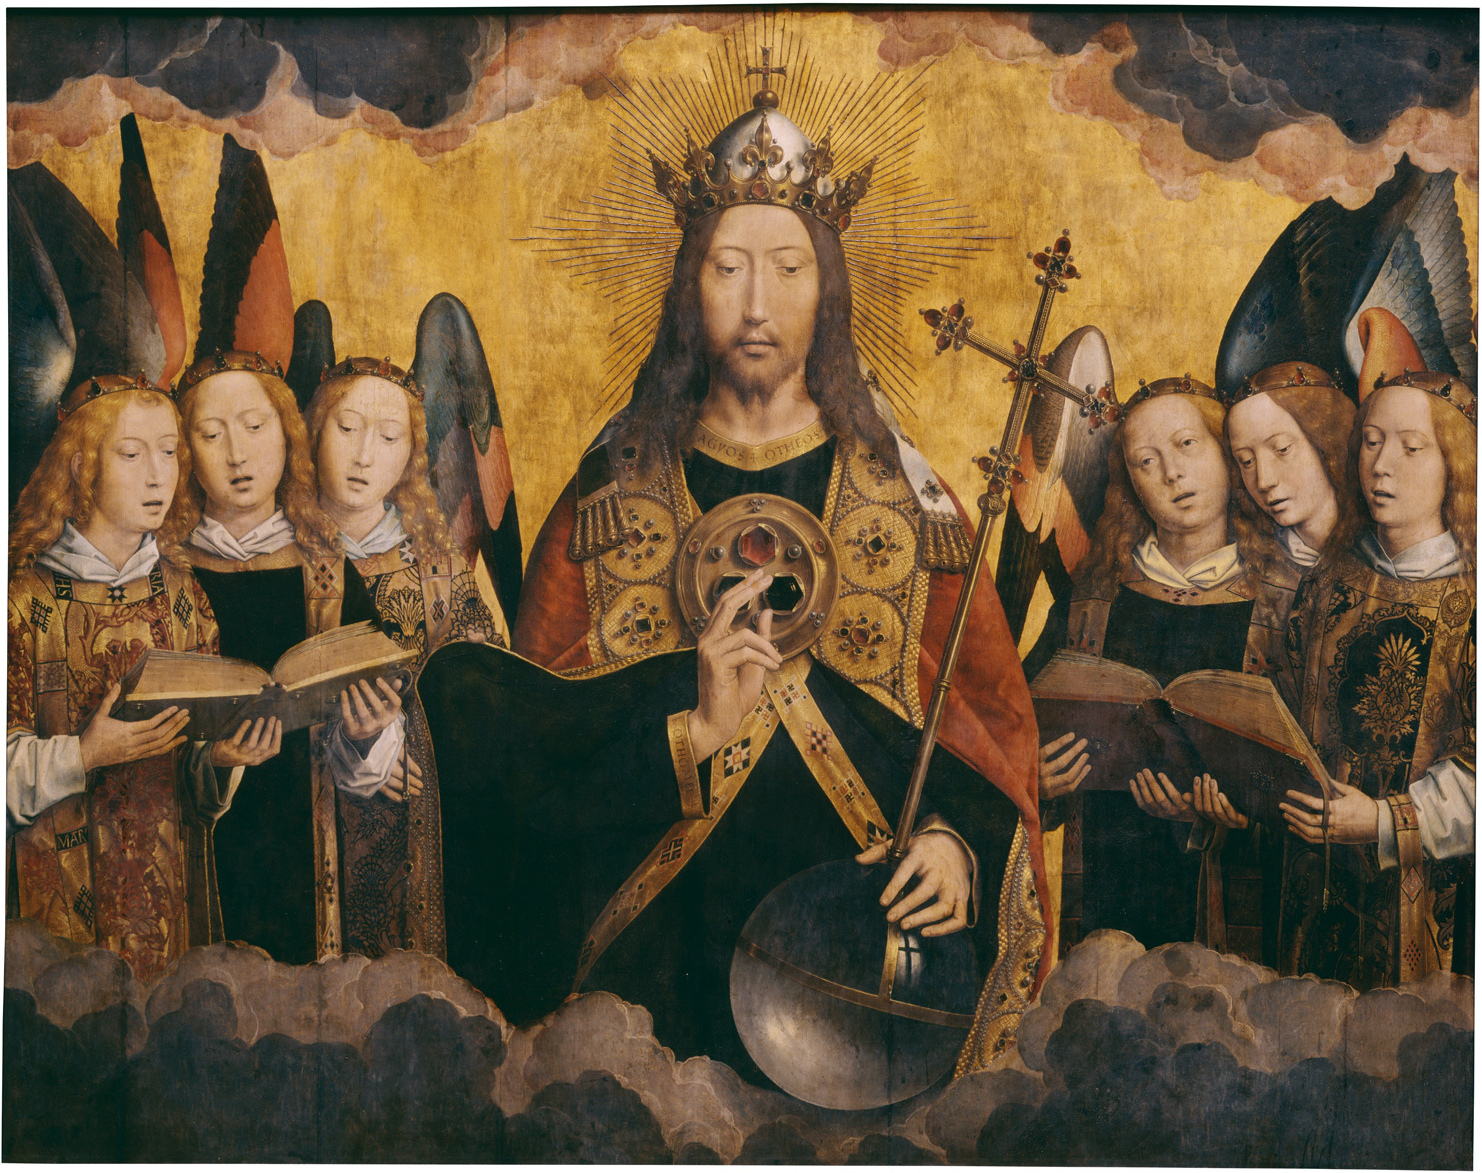 Hans_Memling_-_Christ_with_Singing_Angels_-_KMSKA_778.jpg